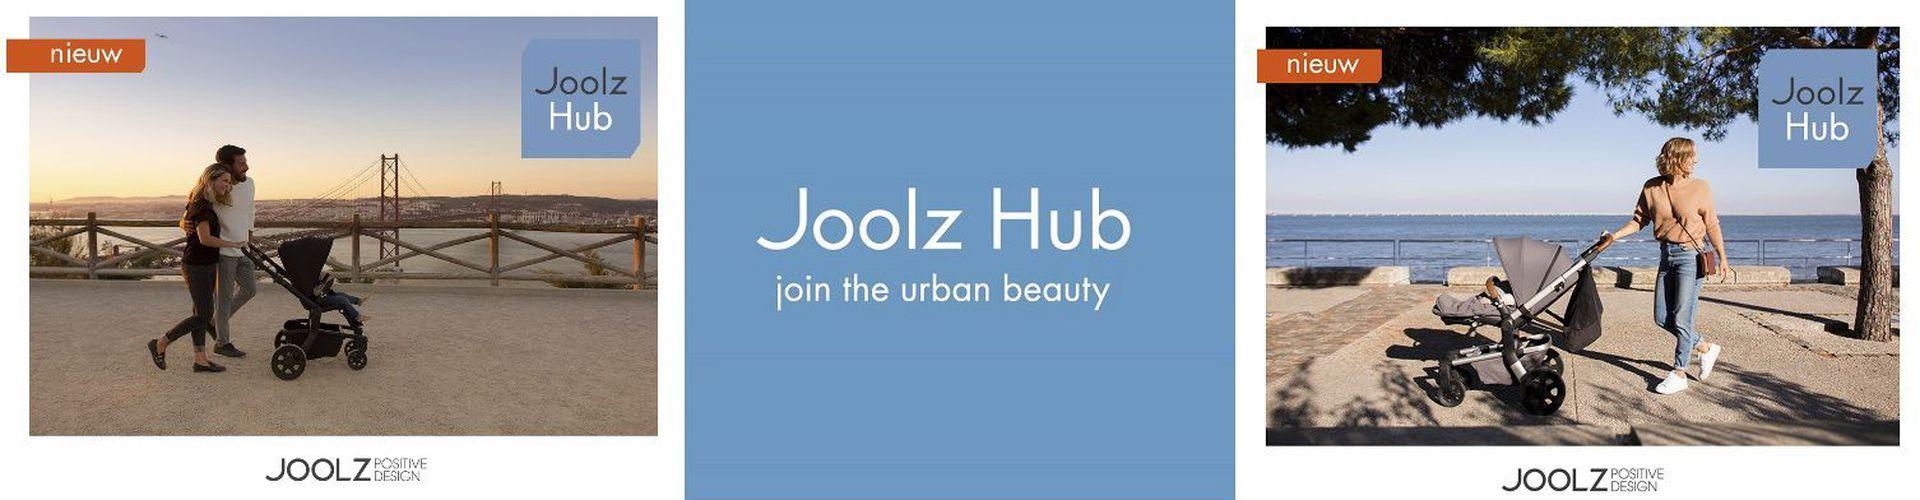 Joolz HUB